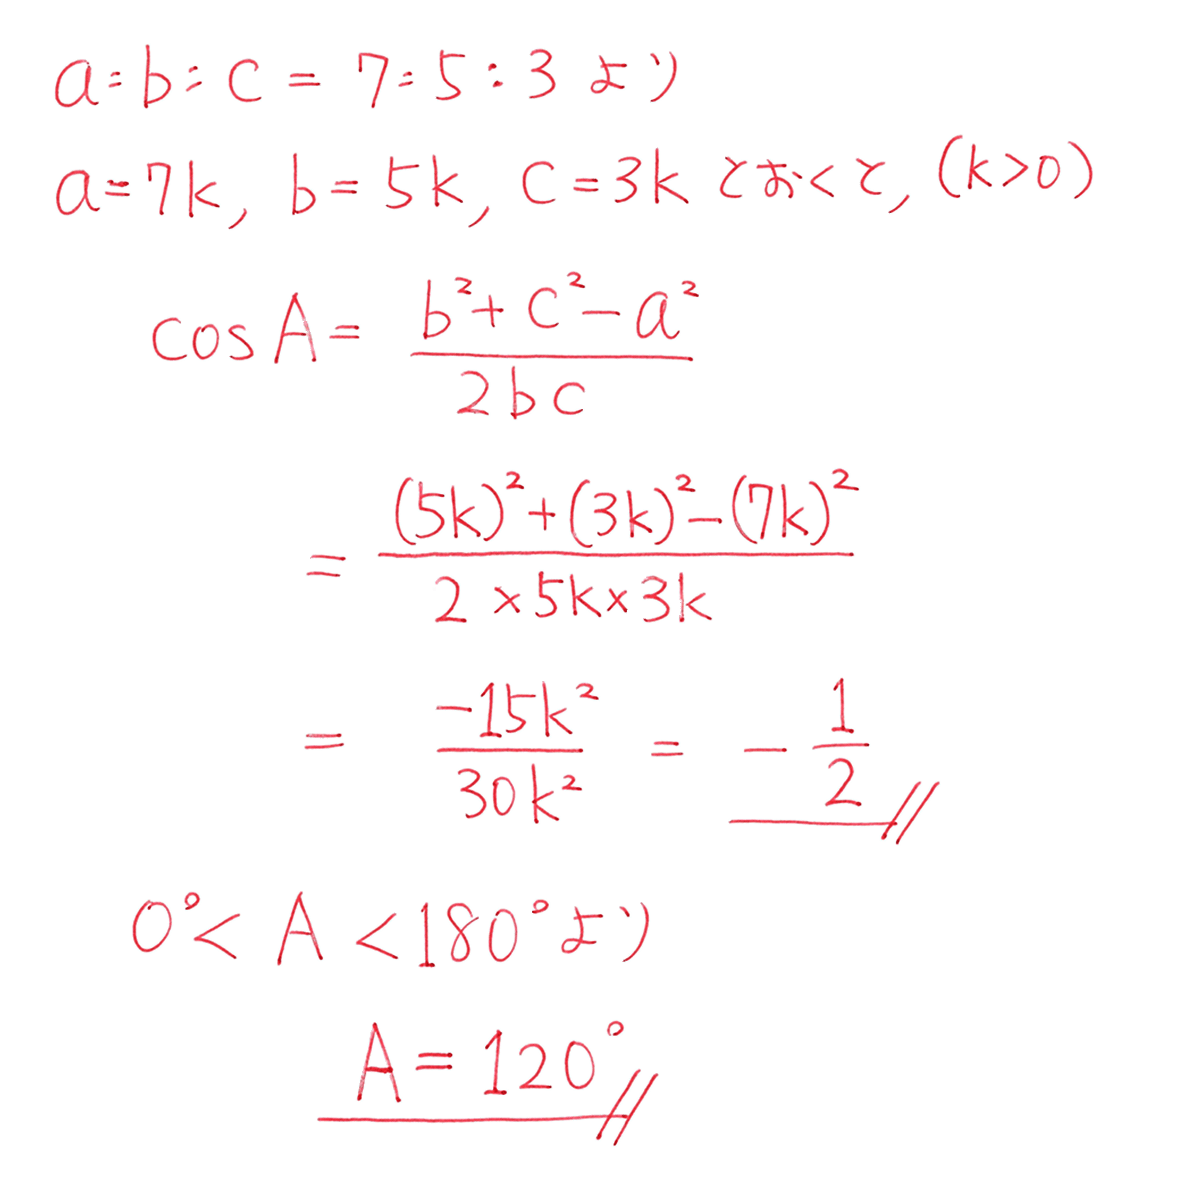 高校数学Ⅰ 三角比27 練習の答え